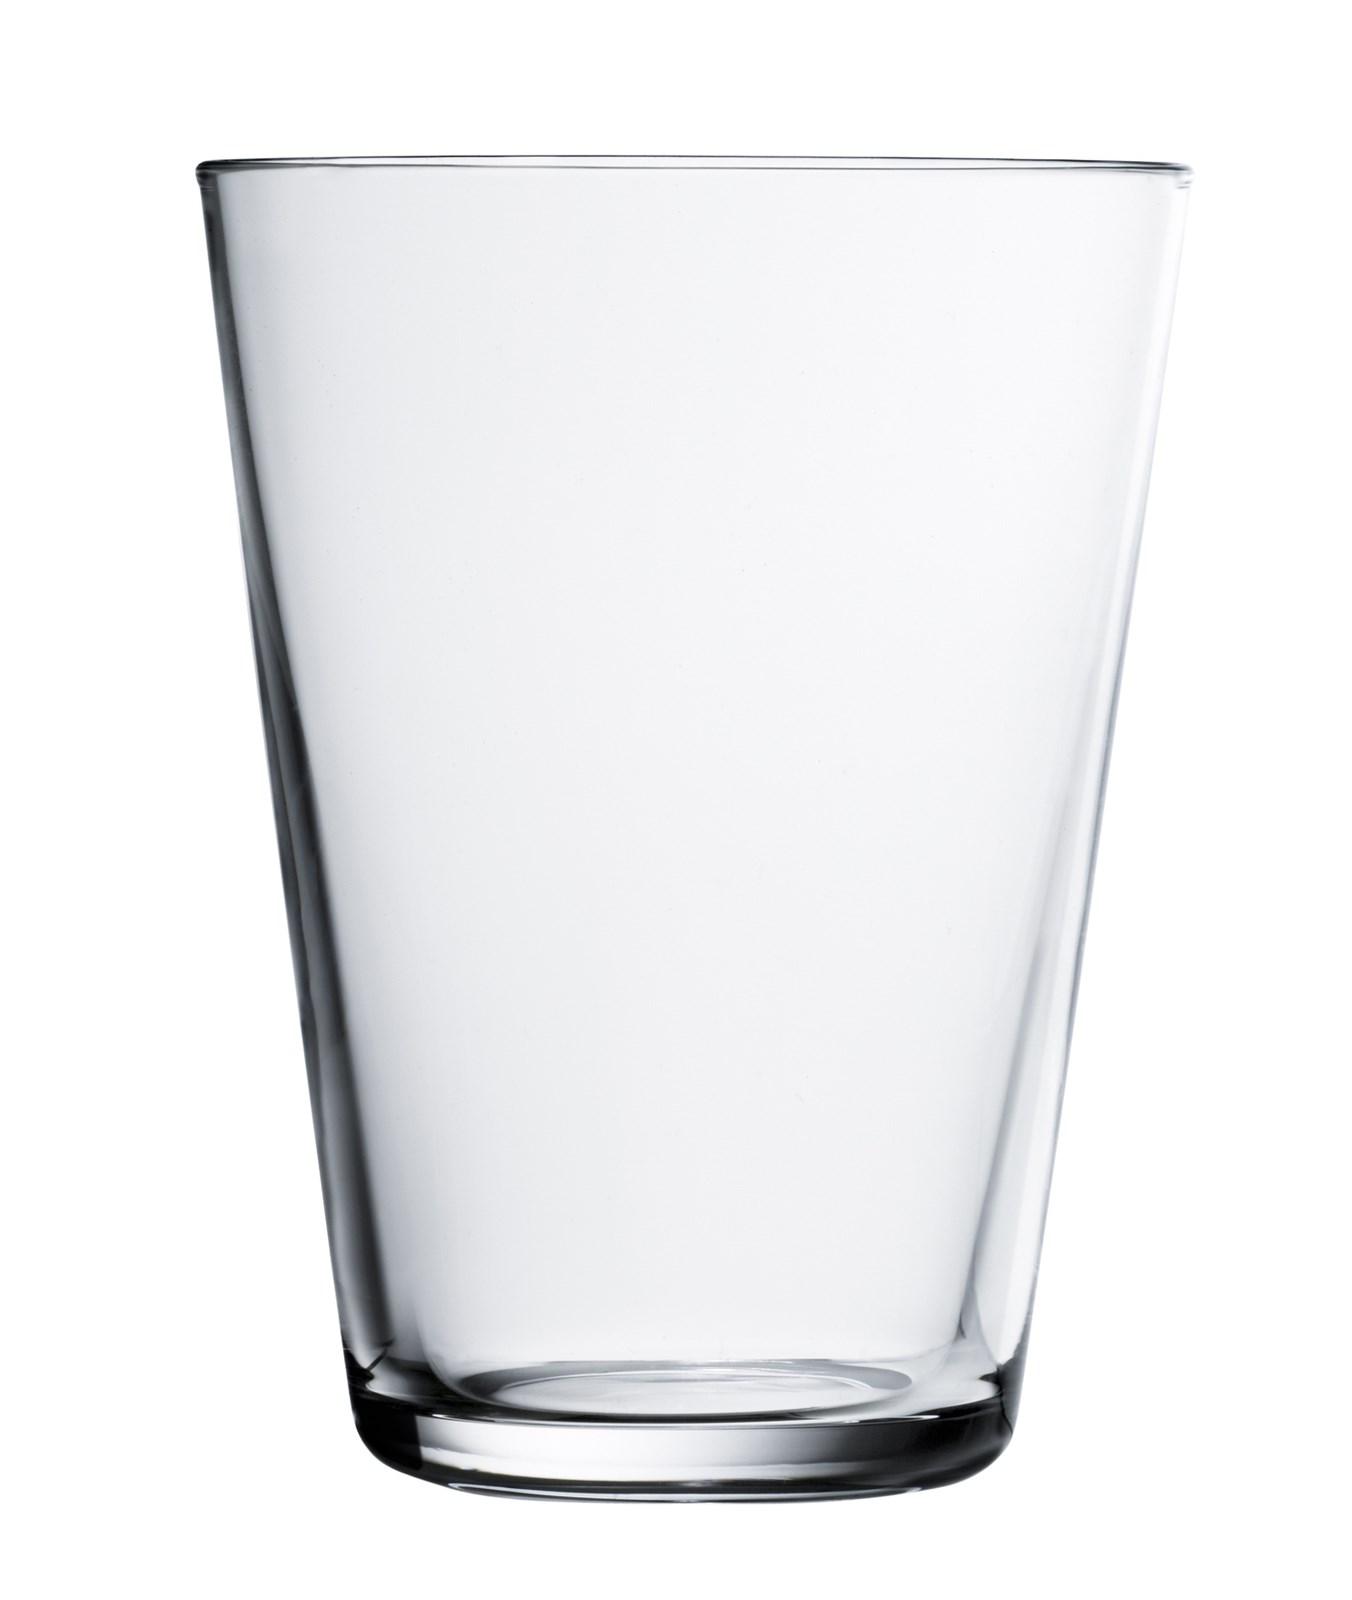 Iittala Kartio Glass klar 2stk 40 cl